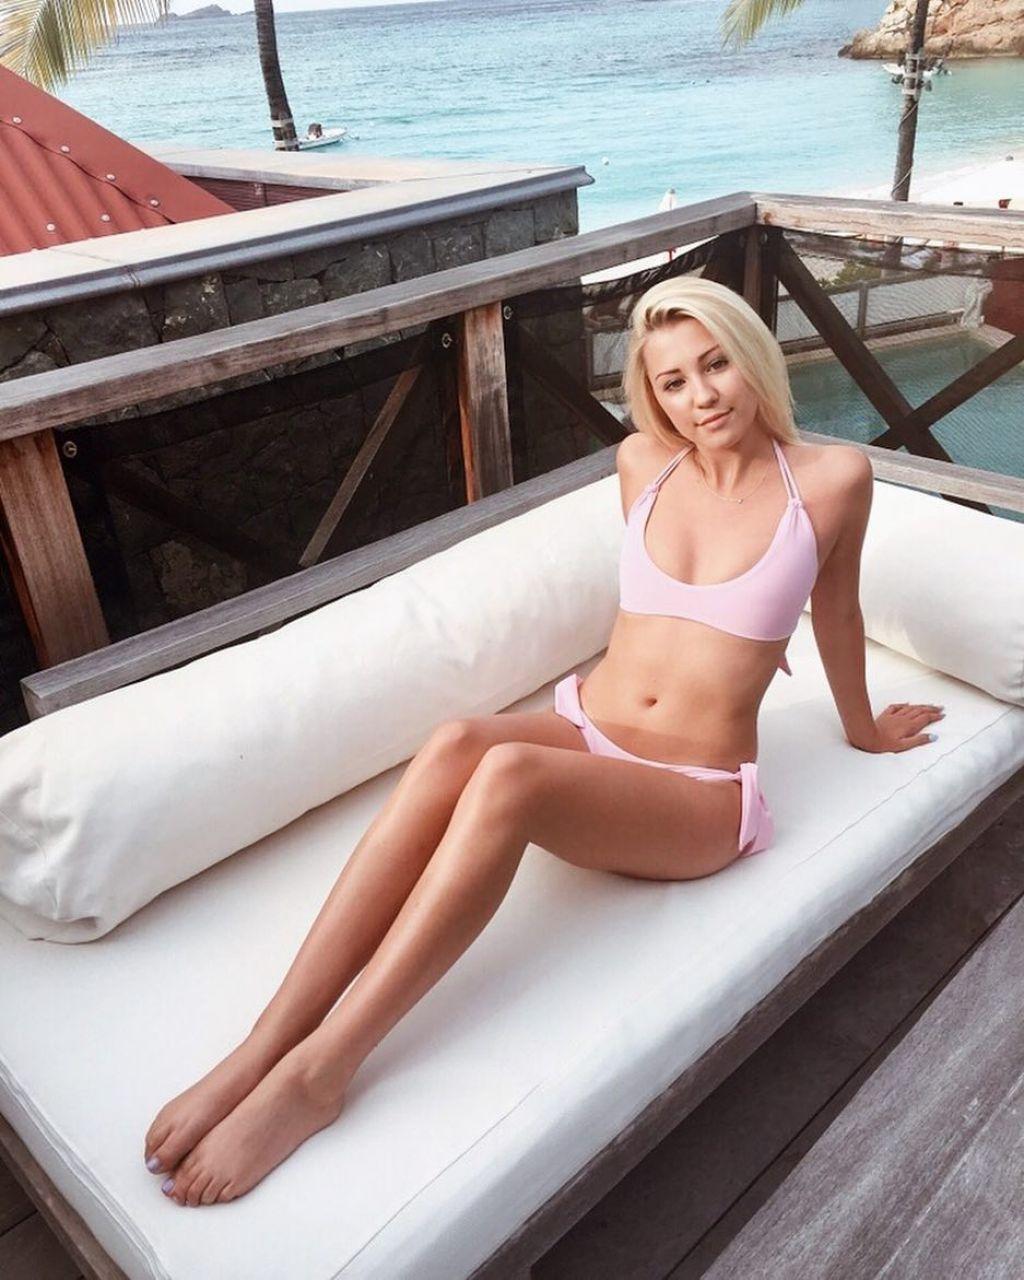 Ava sambora pink bikini